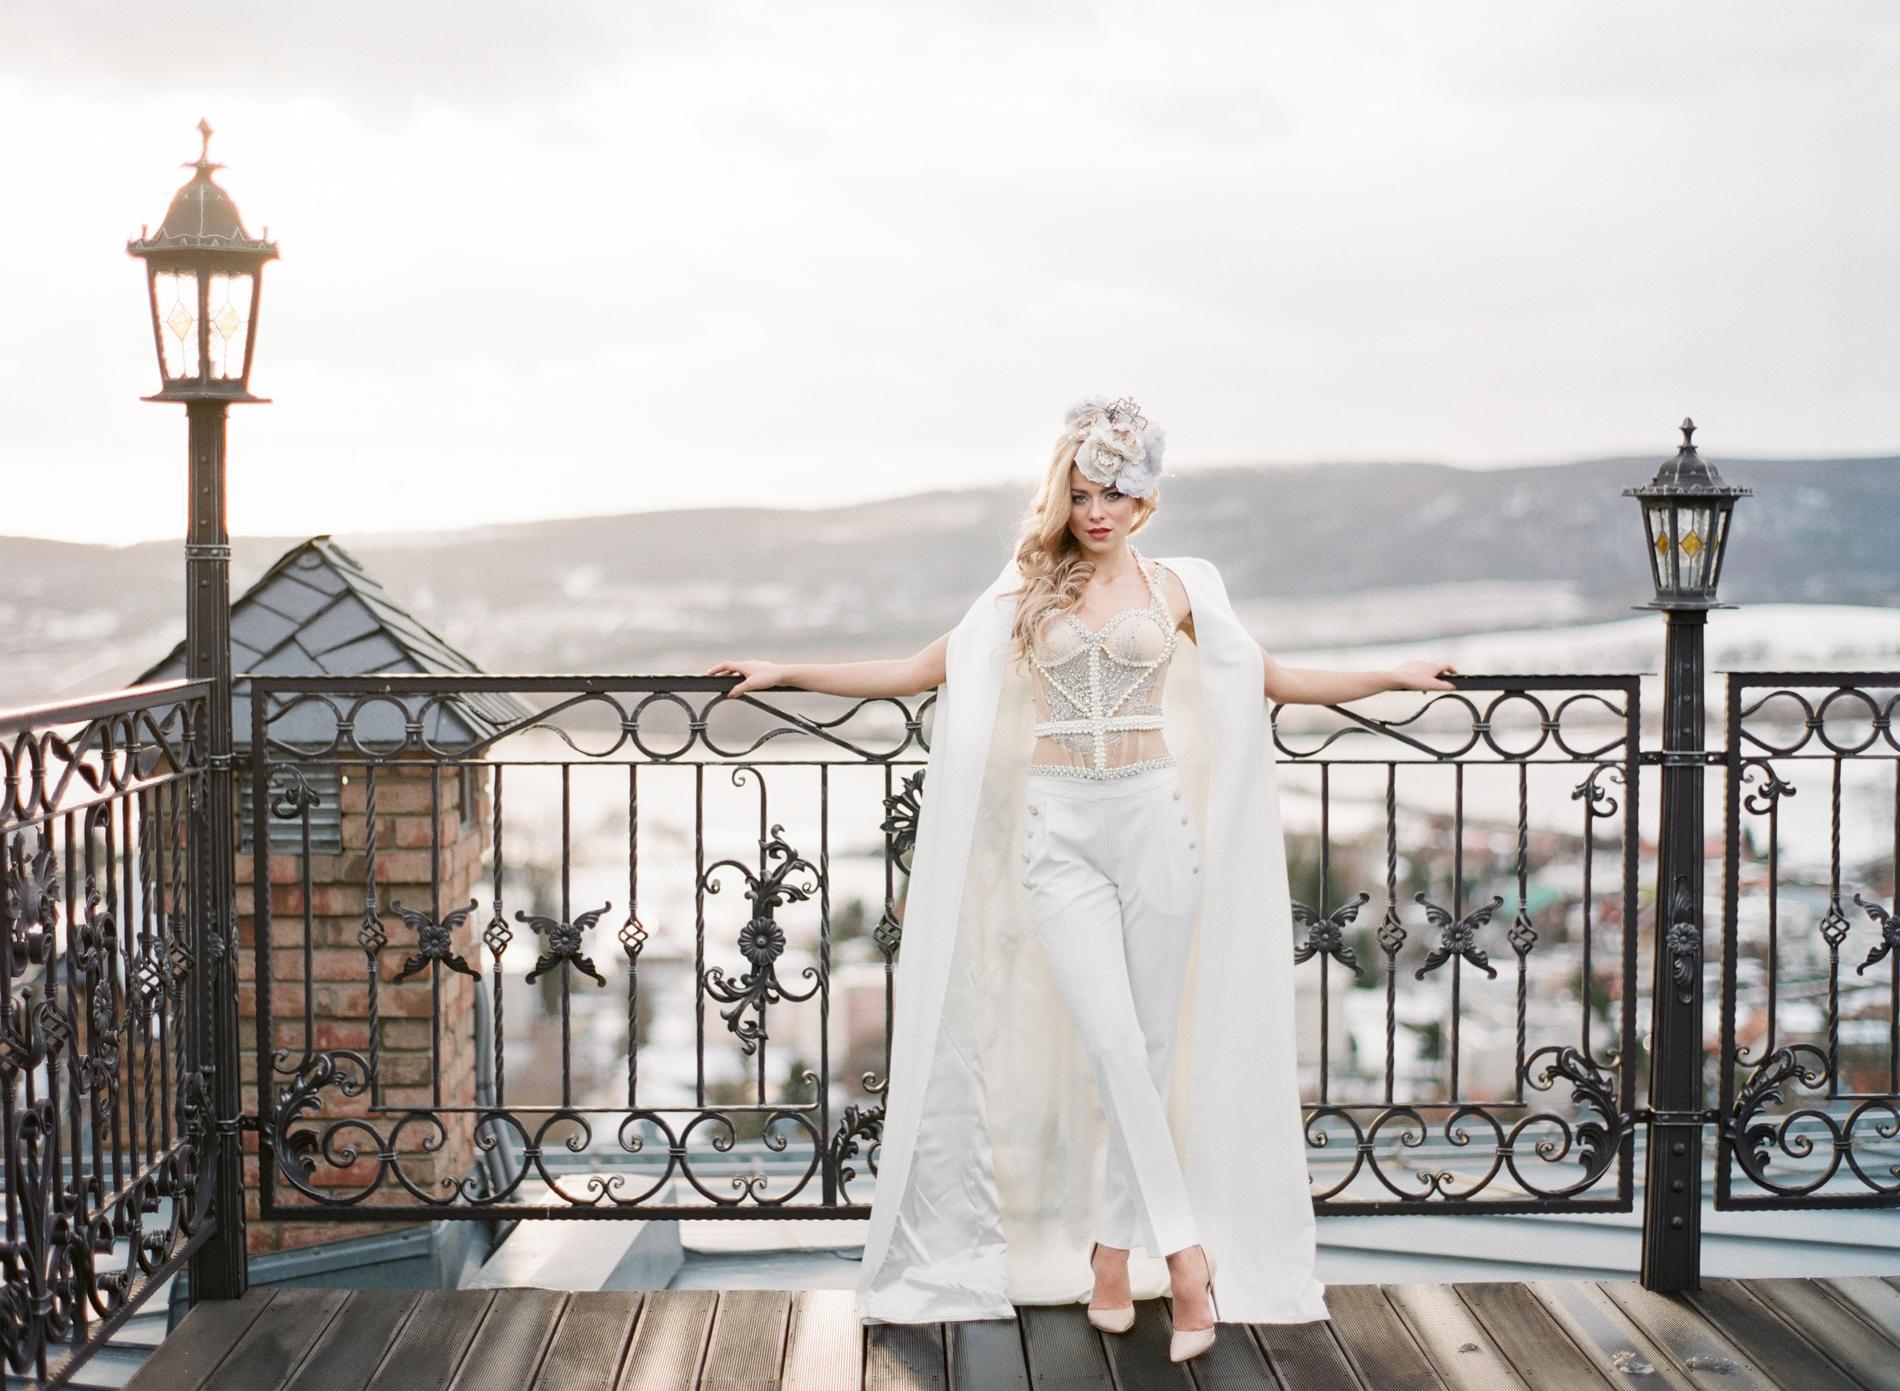 galicia_nueva_wedding_photographer_nikol_bodnarova_italy_wedding_photographer_141.JPG